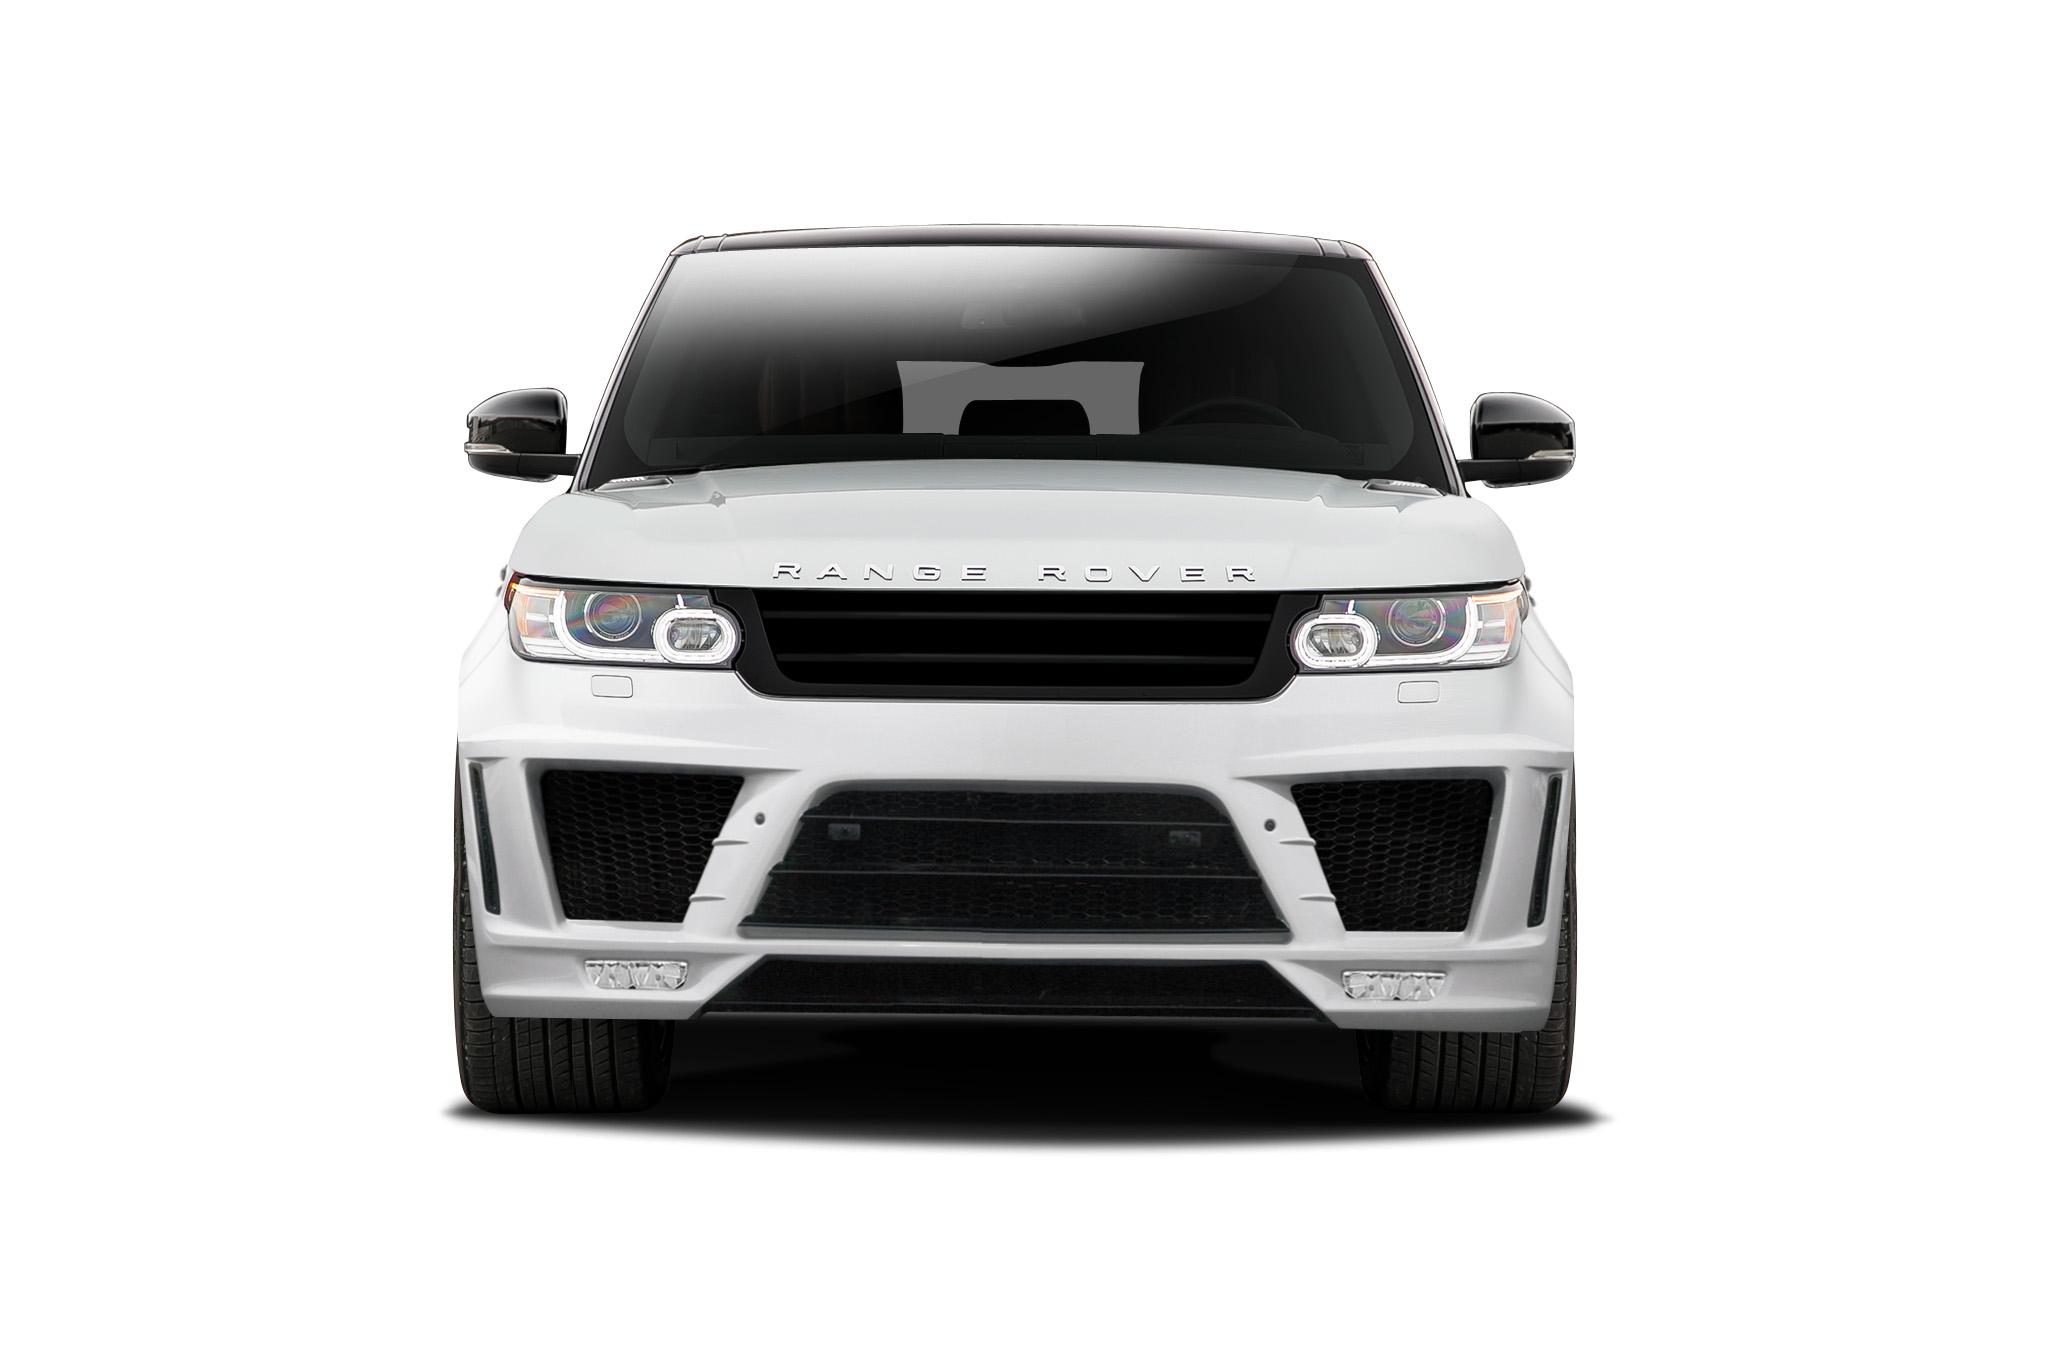 2014-2015 Land Rover Range Rover Sport Urethane AF-1 Front Bumper ( PUR-RIM ) - 1 Piece